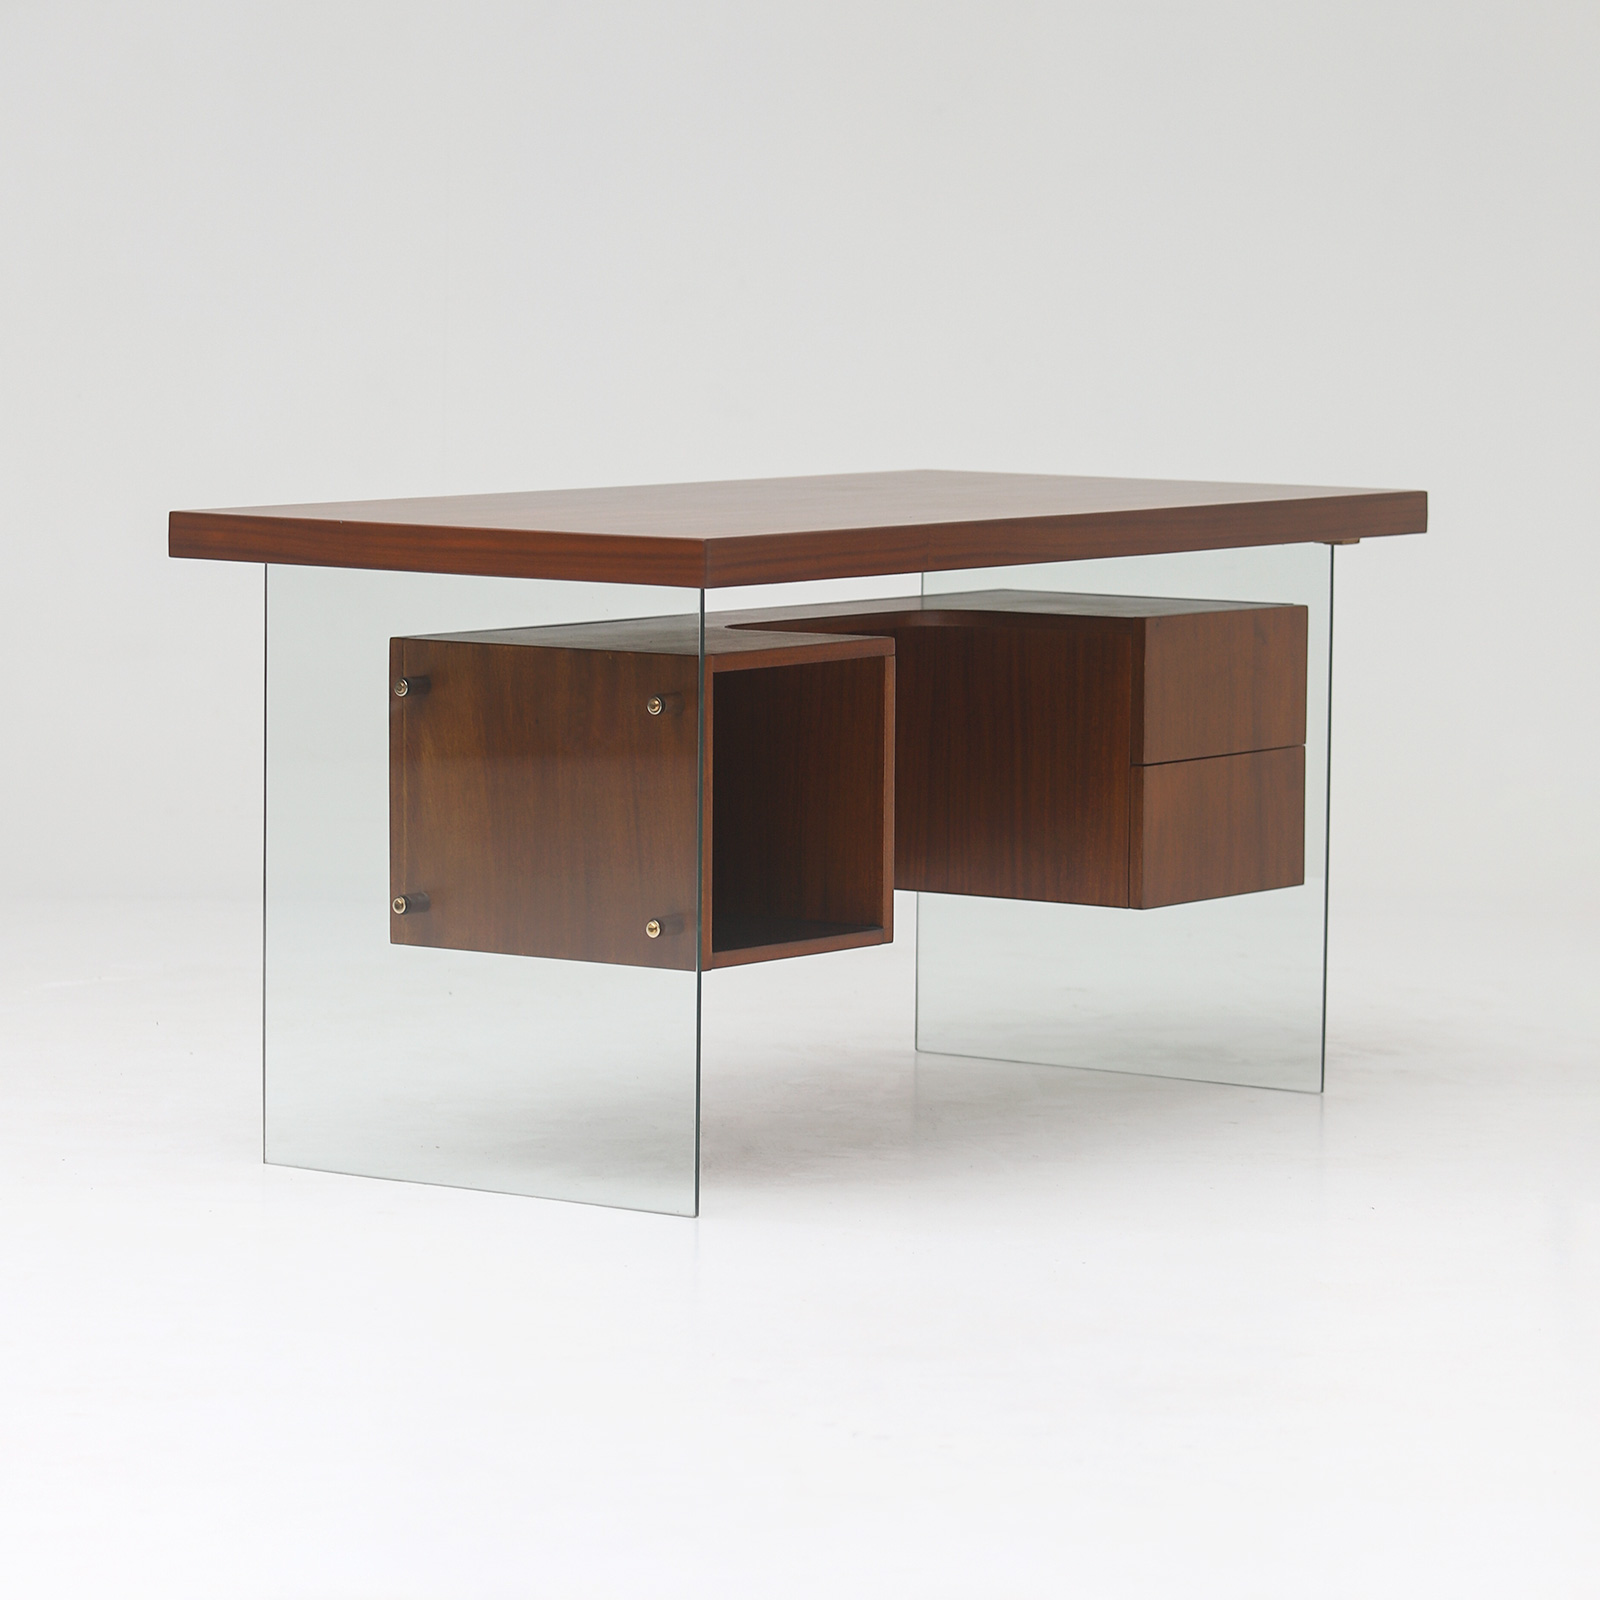 Modernist desk in the manner of Jacques Dumond, 1950s